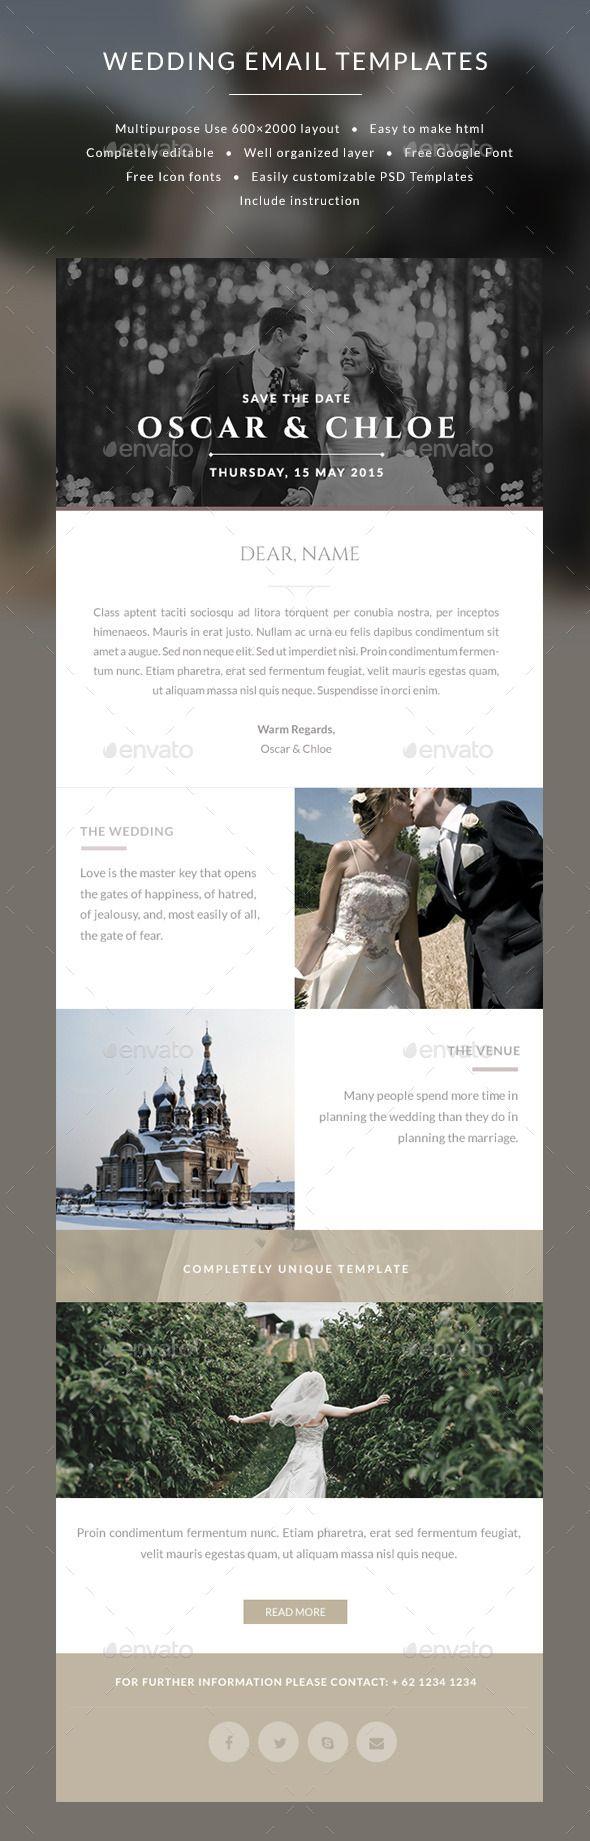 Email Wedding Invitation templates - Oscar - E-newsletters Web Elements